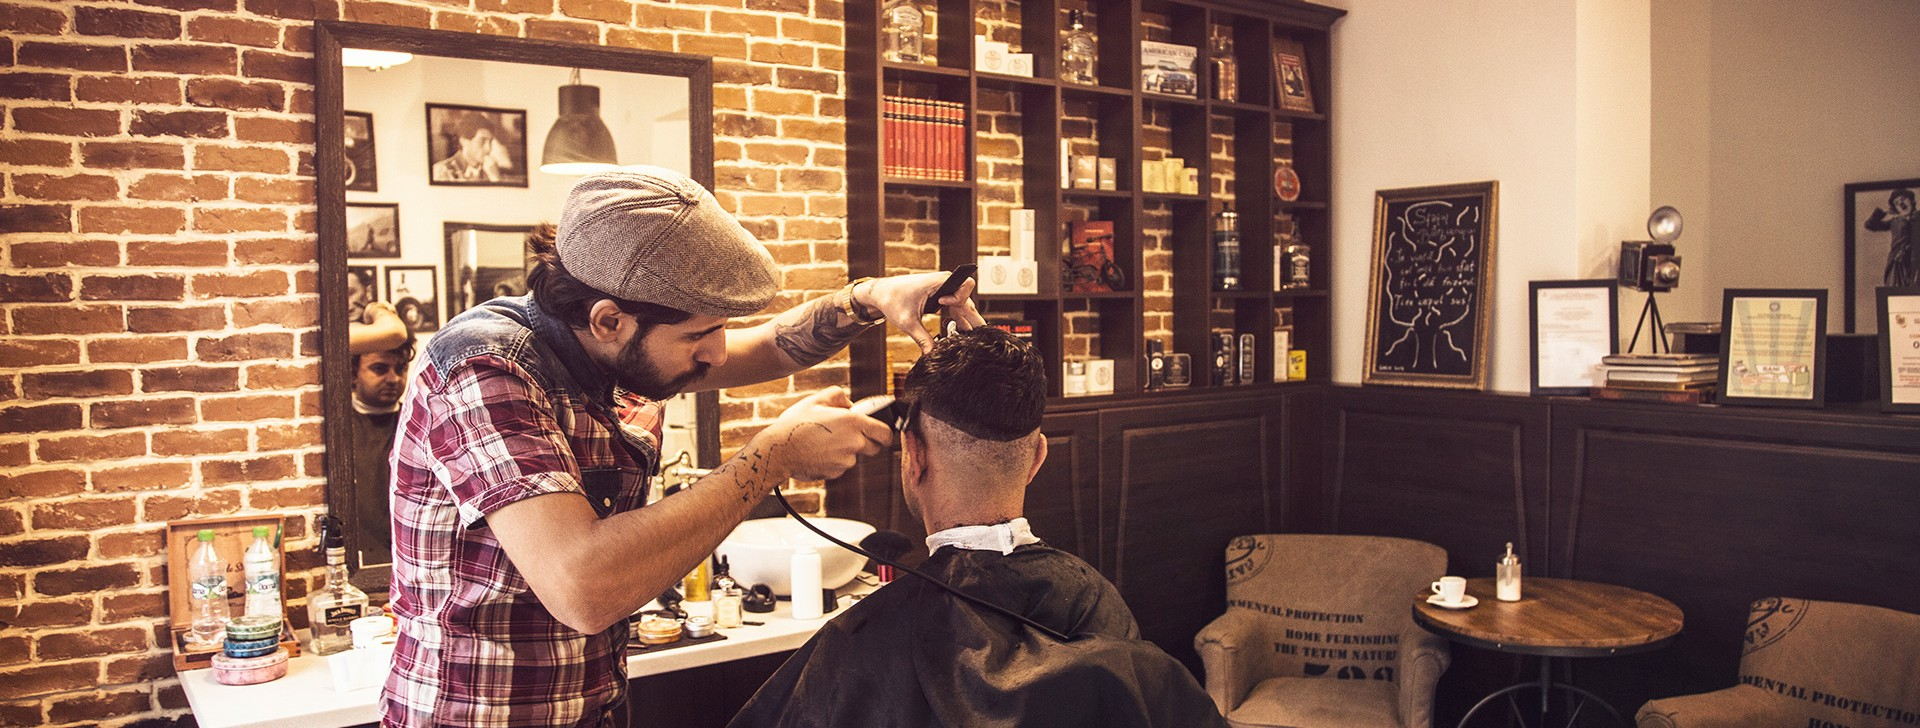 acasa-the-barber-barbershop-bucuresti-slider-03